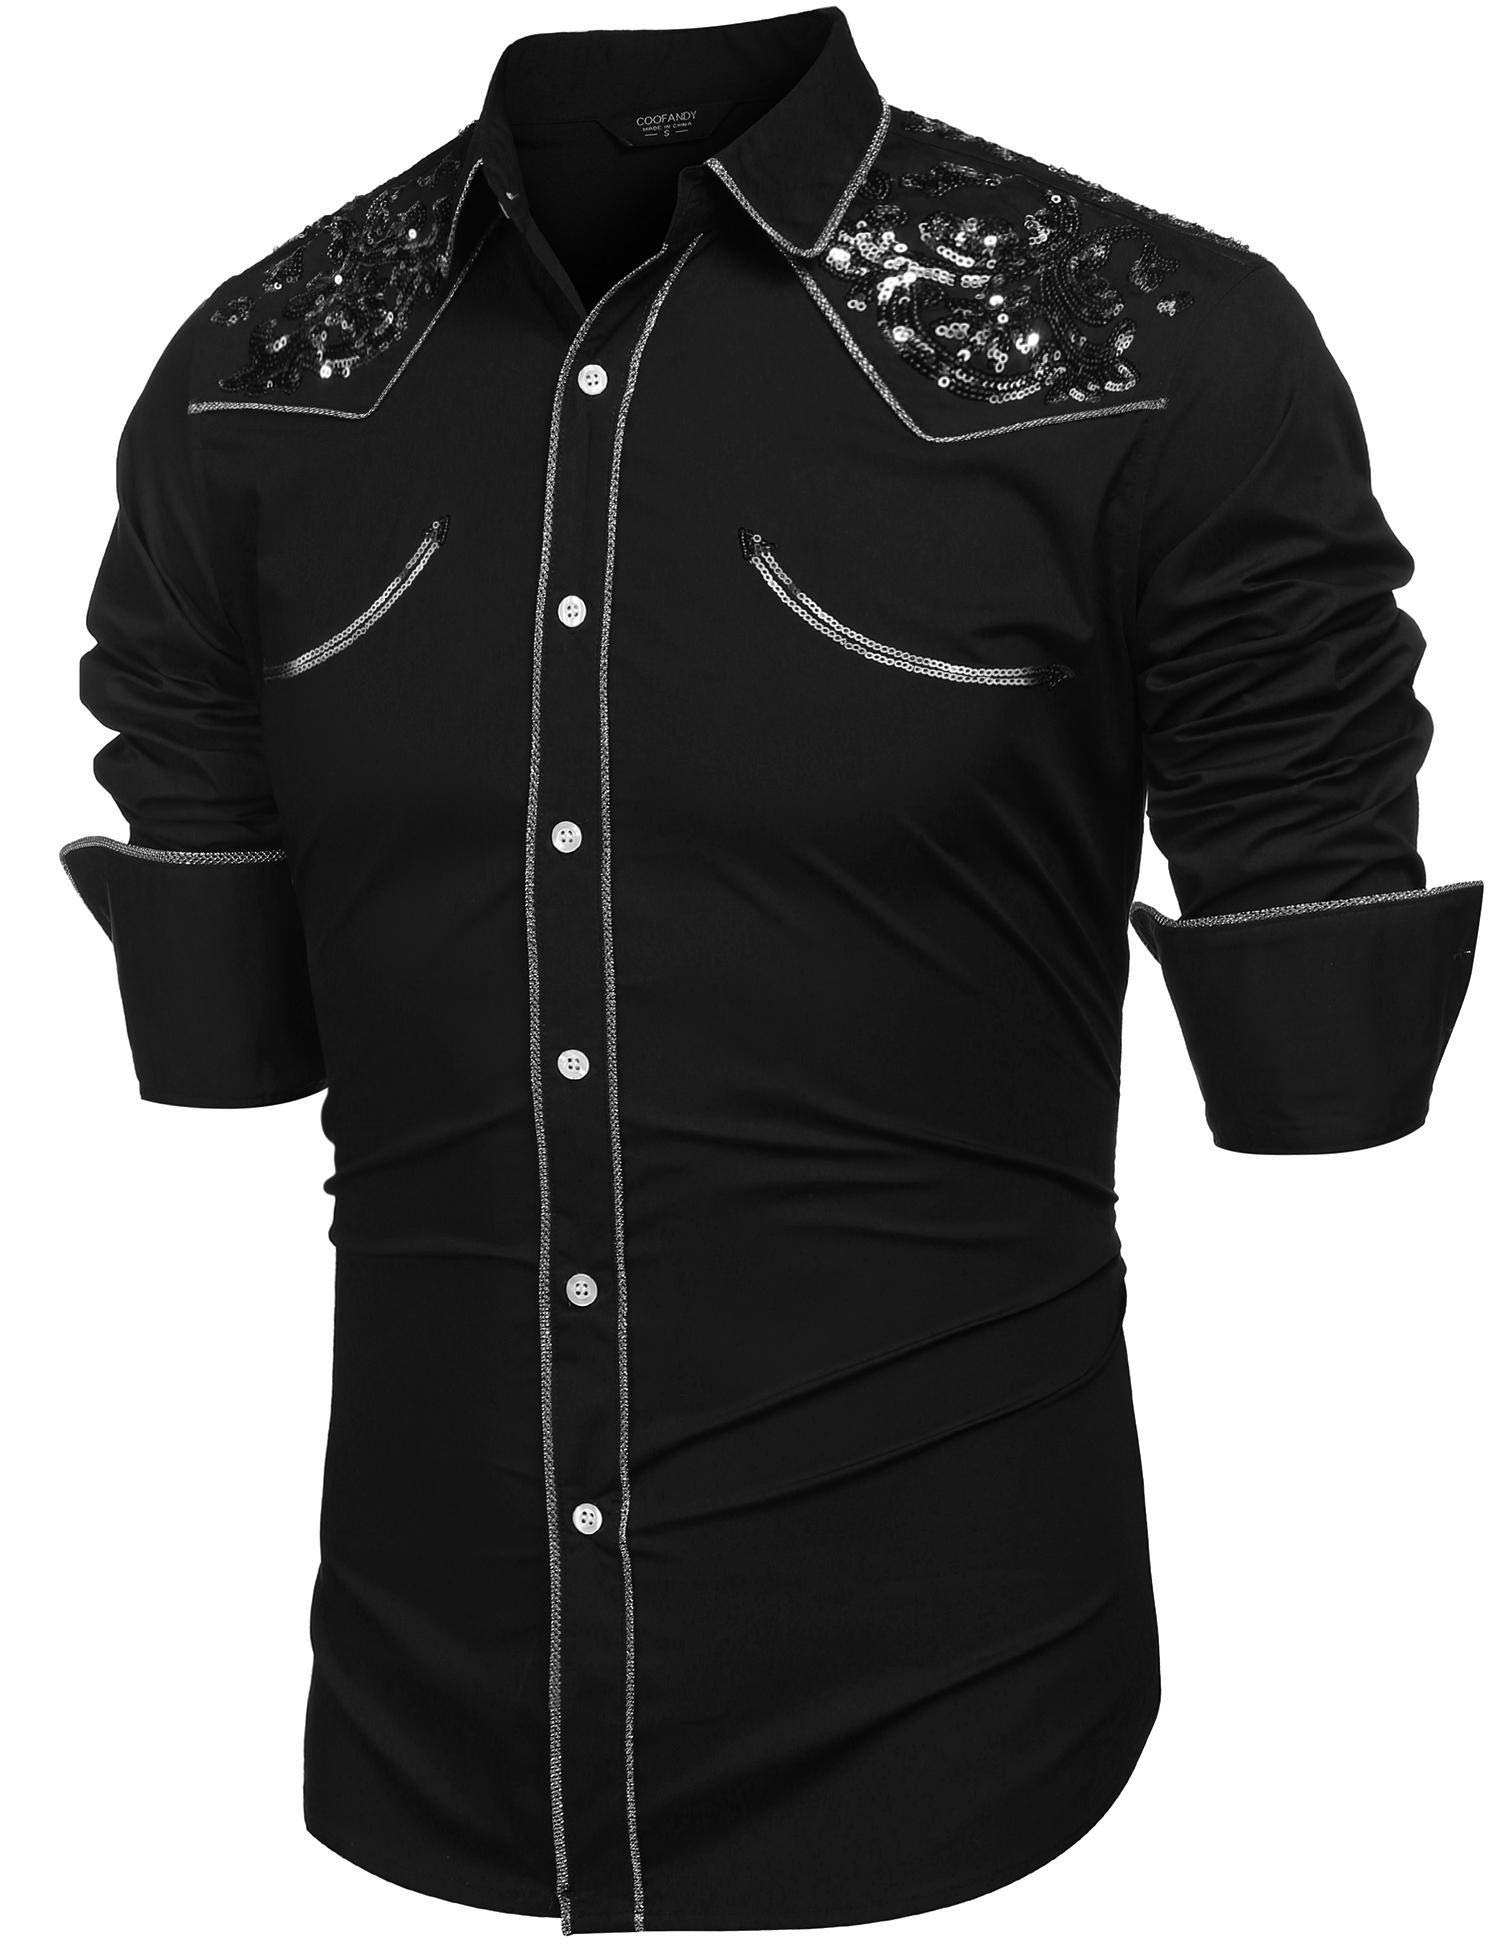 Zantt Mens Shirt Long Sleeve Button Down Embroidery Slim Dress Shirts